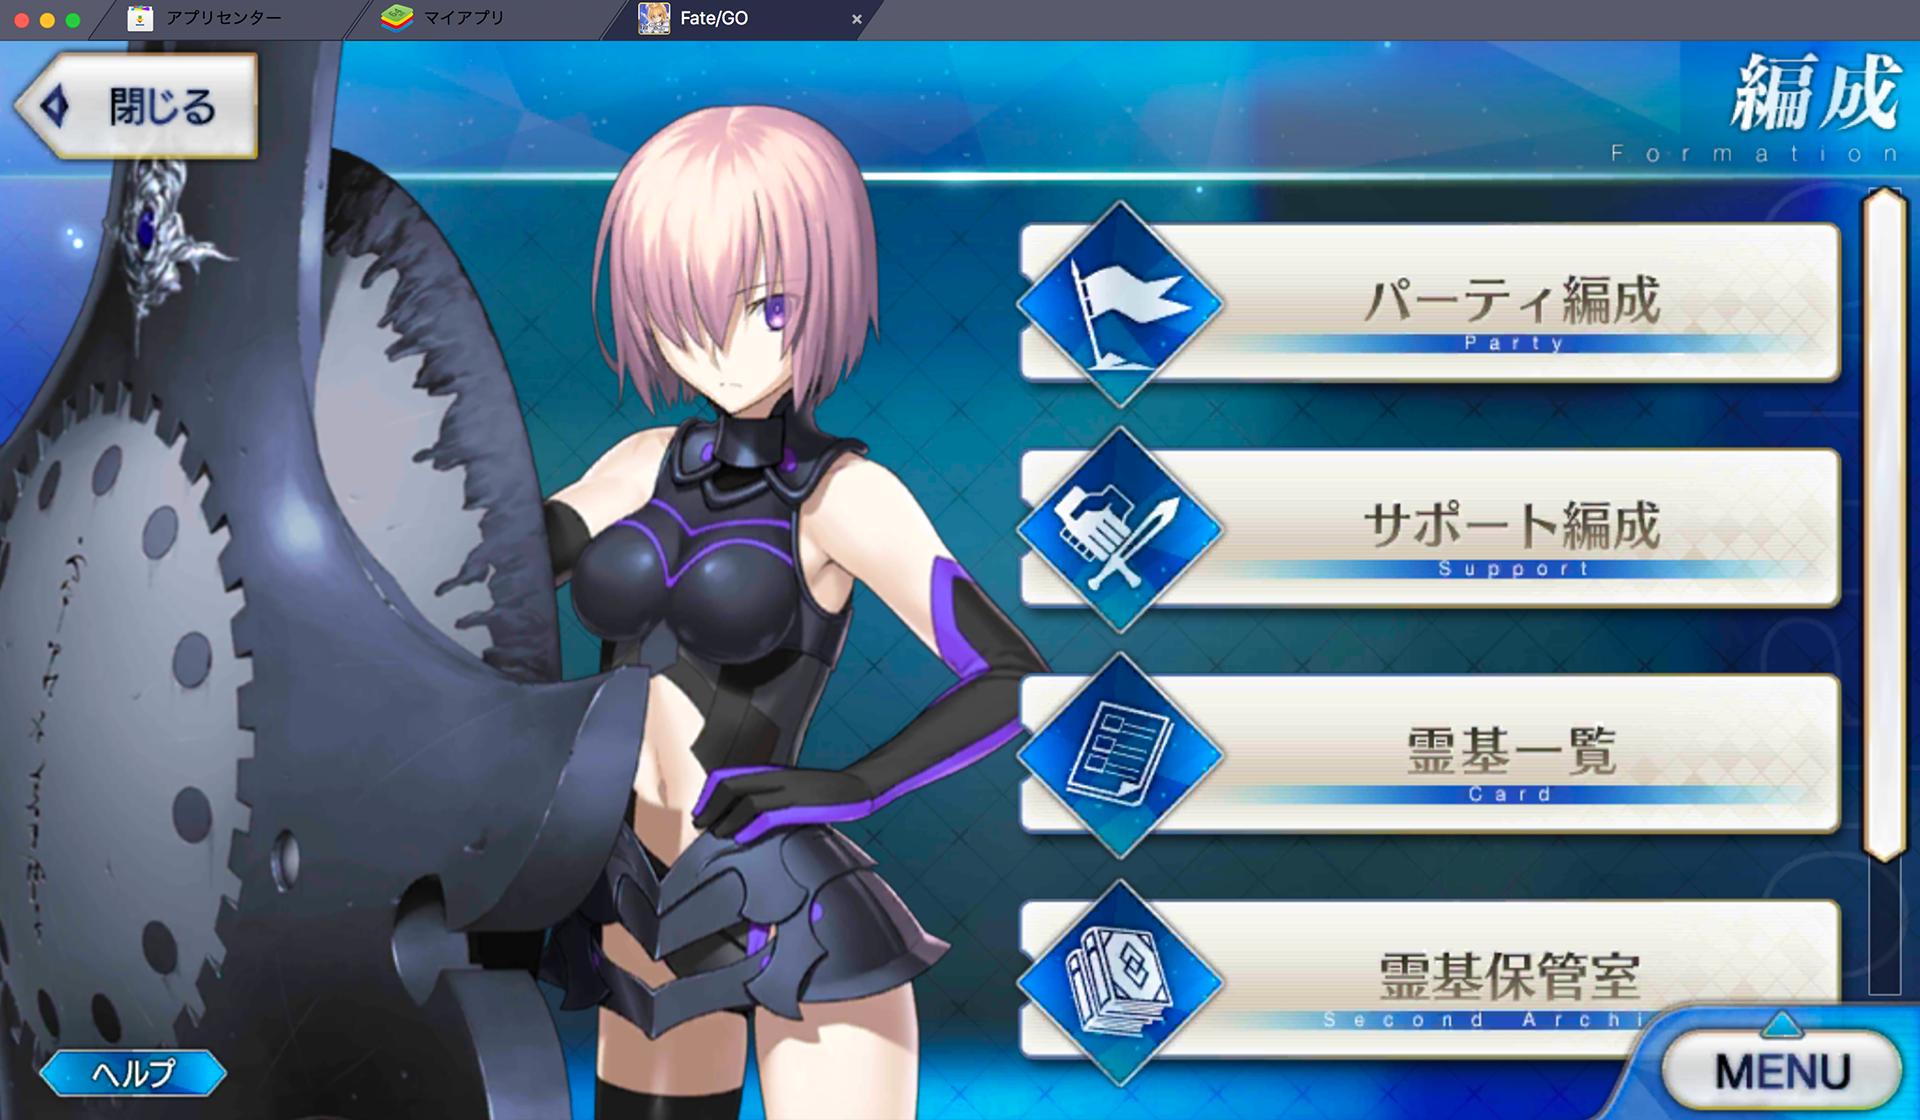 BlueStacks:『Fate/Grand Order』初心者向けガイド・フレンド申請の方法